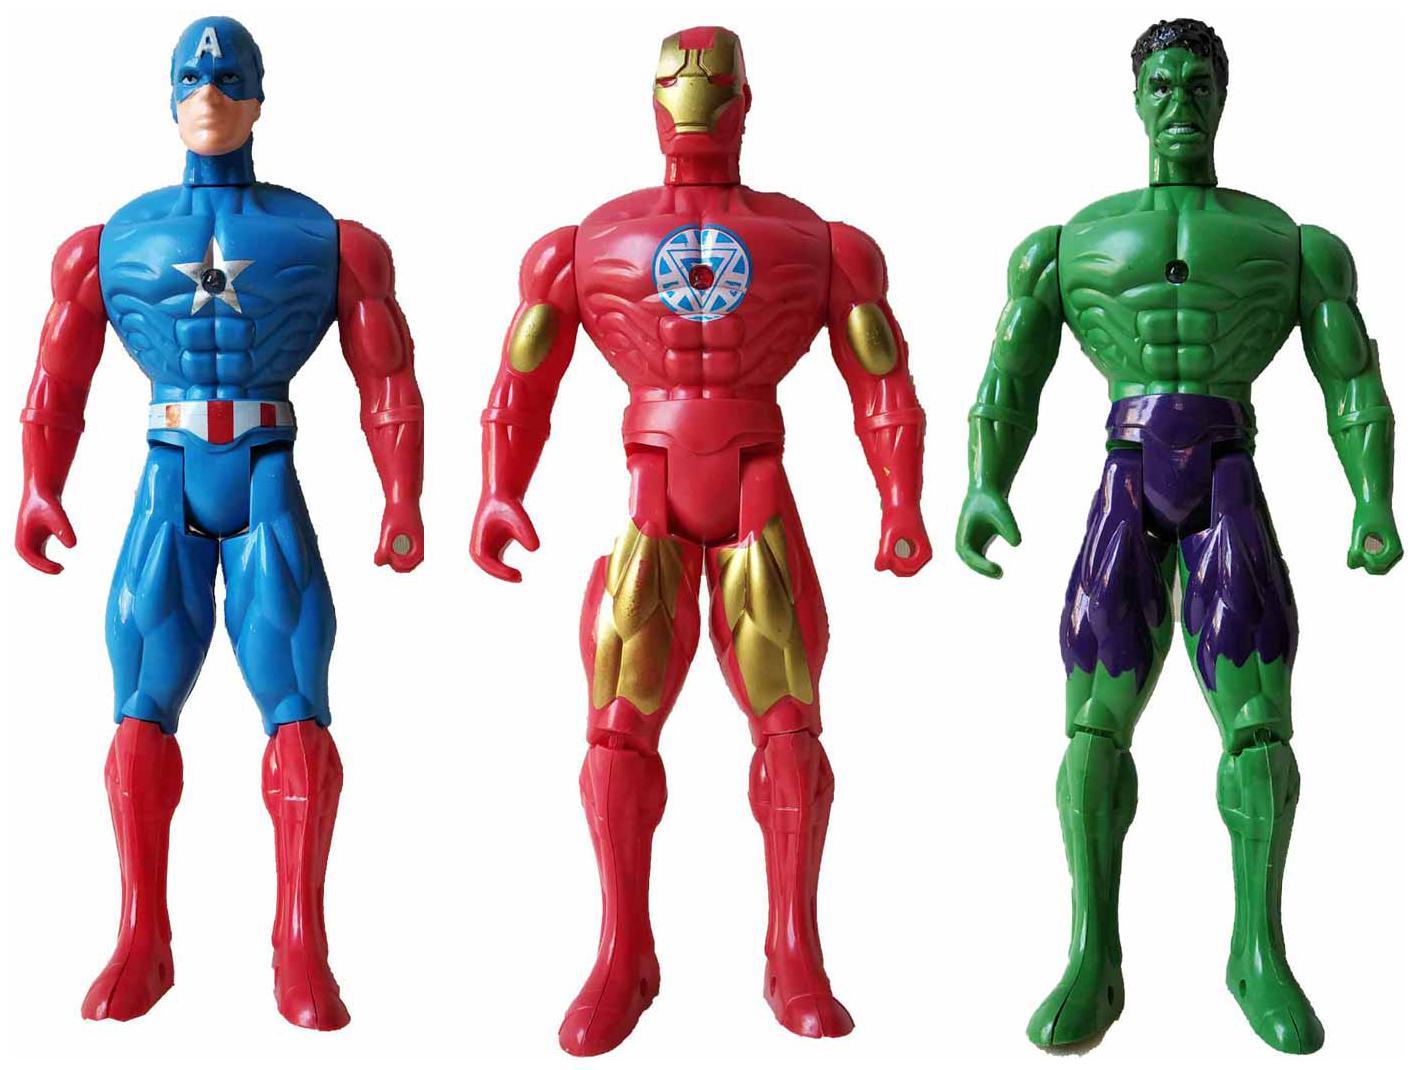 Iron Man,Captain America,Hulk Marvel Toys Avengers Infinity WAR Action   Figure Toys by Viji Enterprises